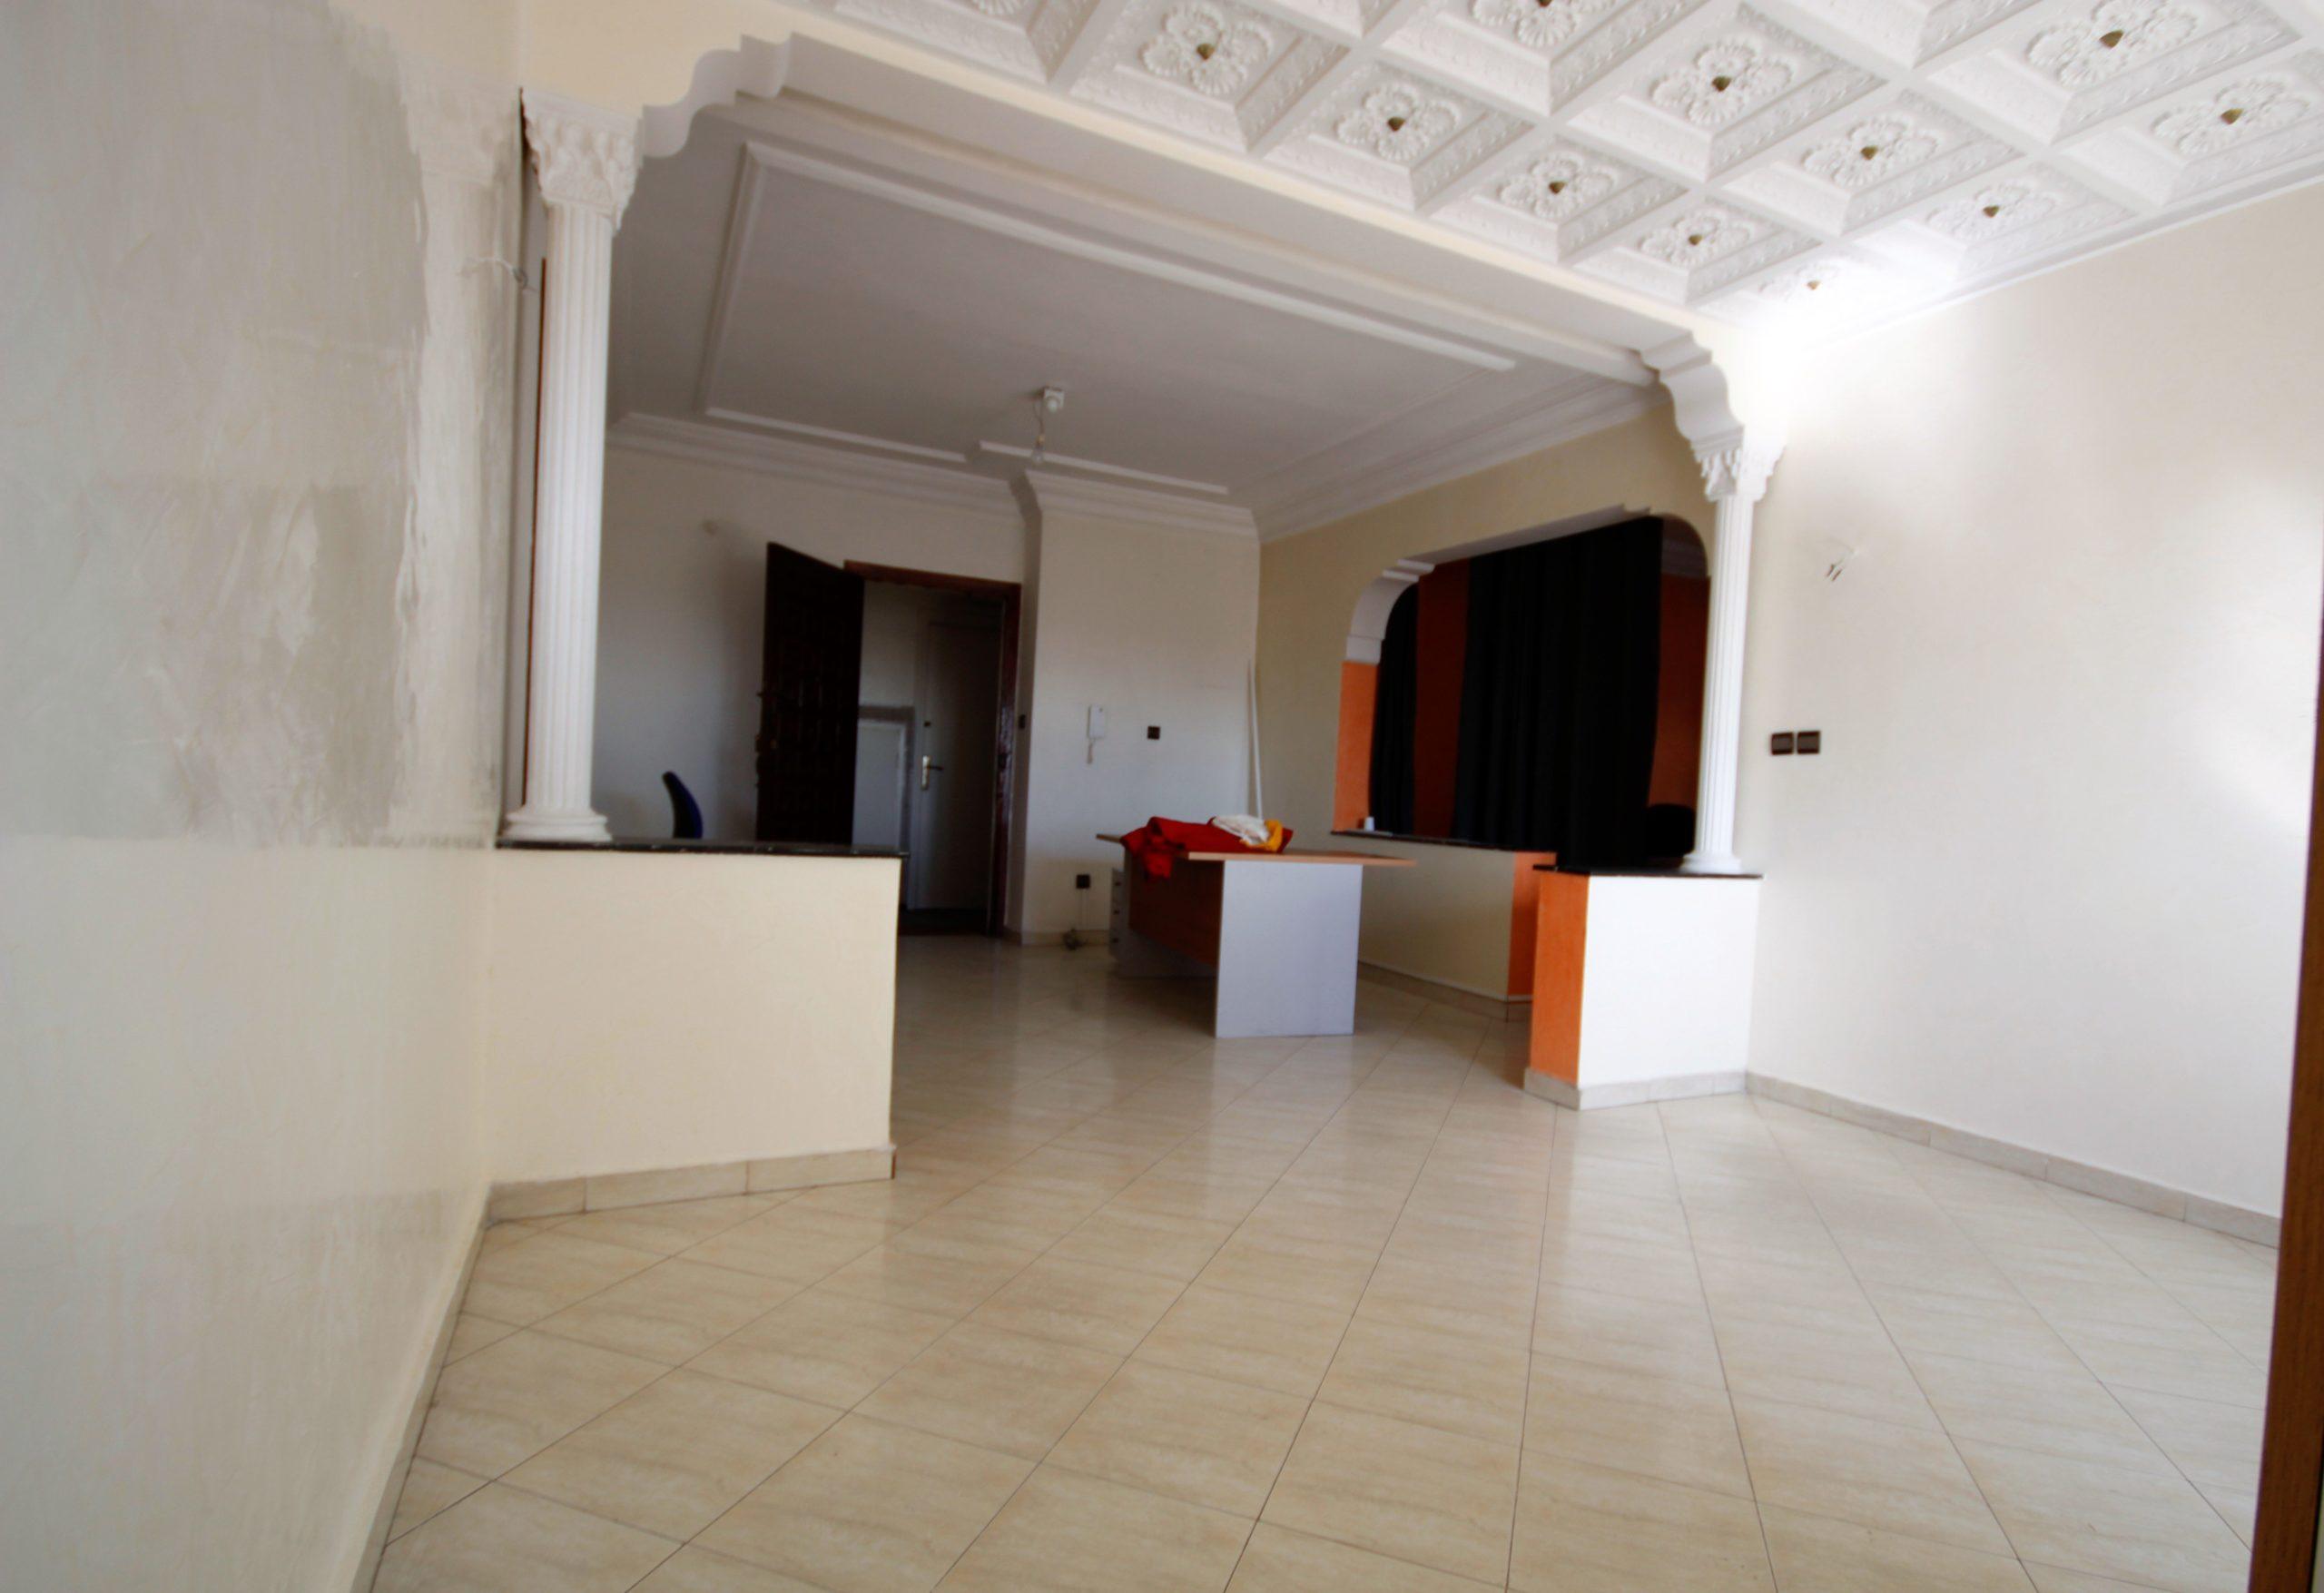 Maroc, Casablanca, Gironde à acheter appartement usage mixte expo sud